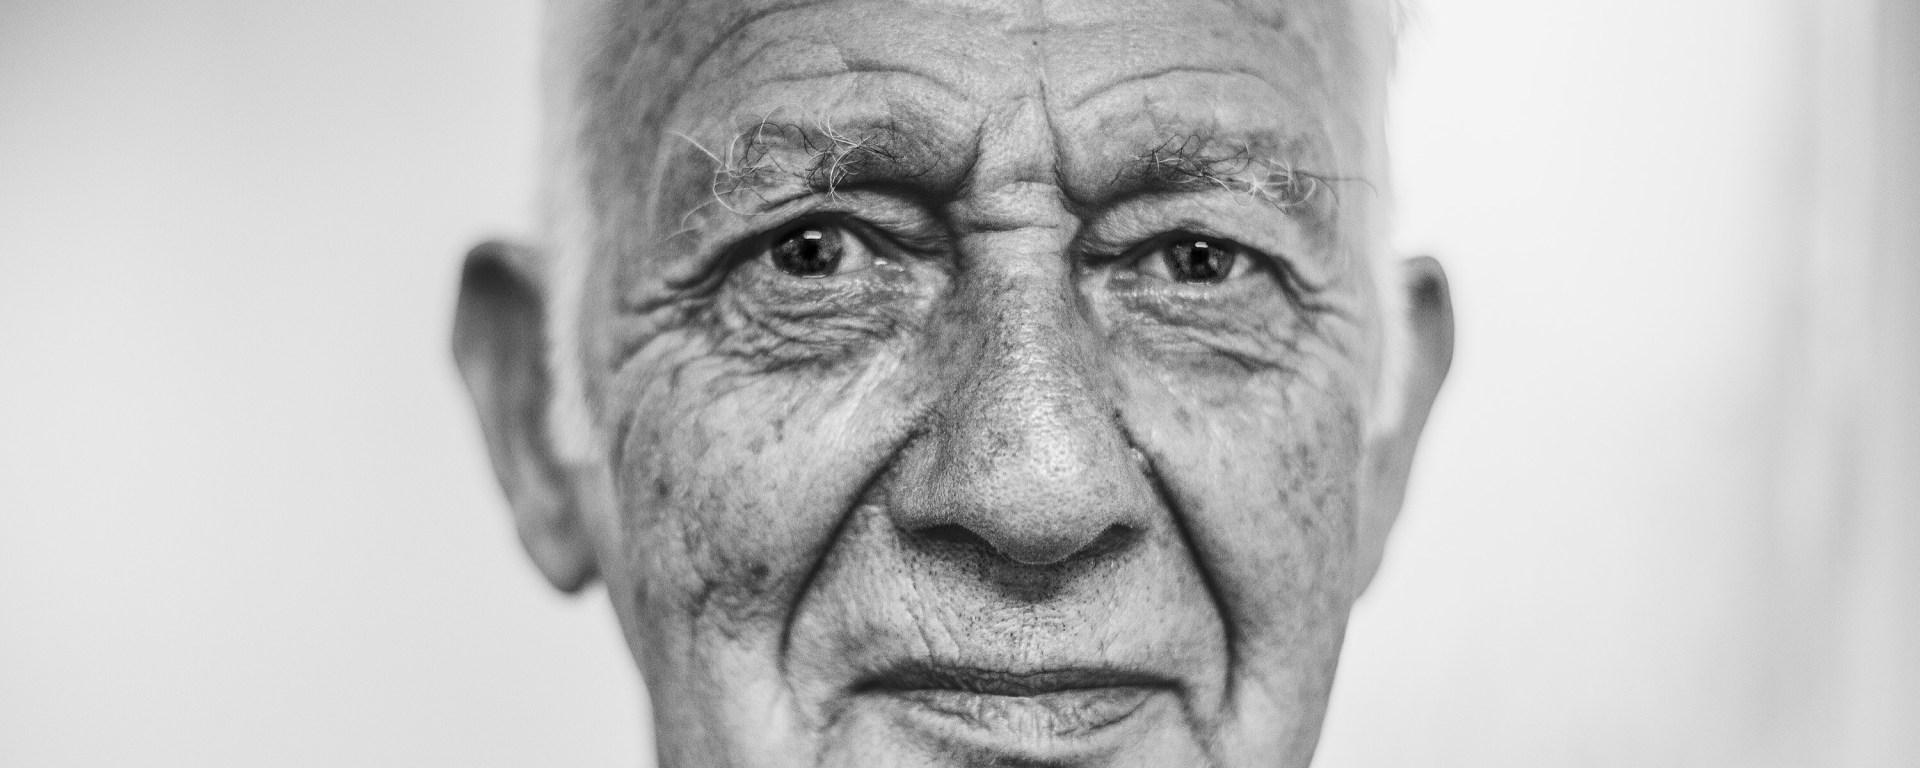 Headshot portrait of elderly man.